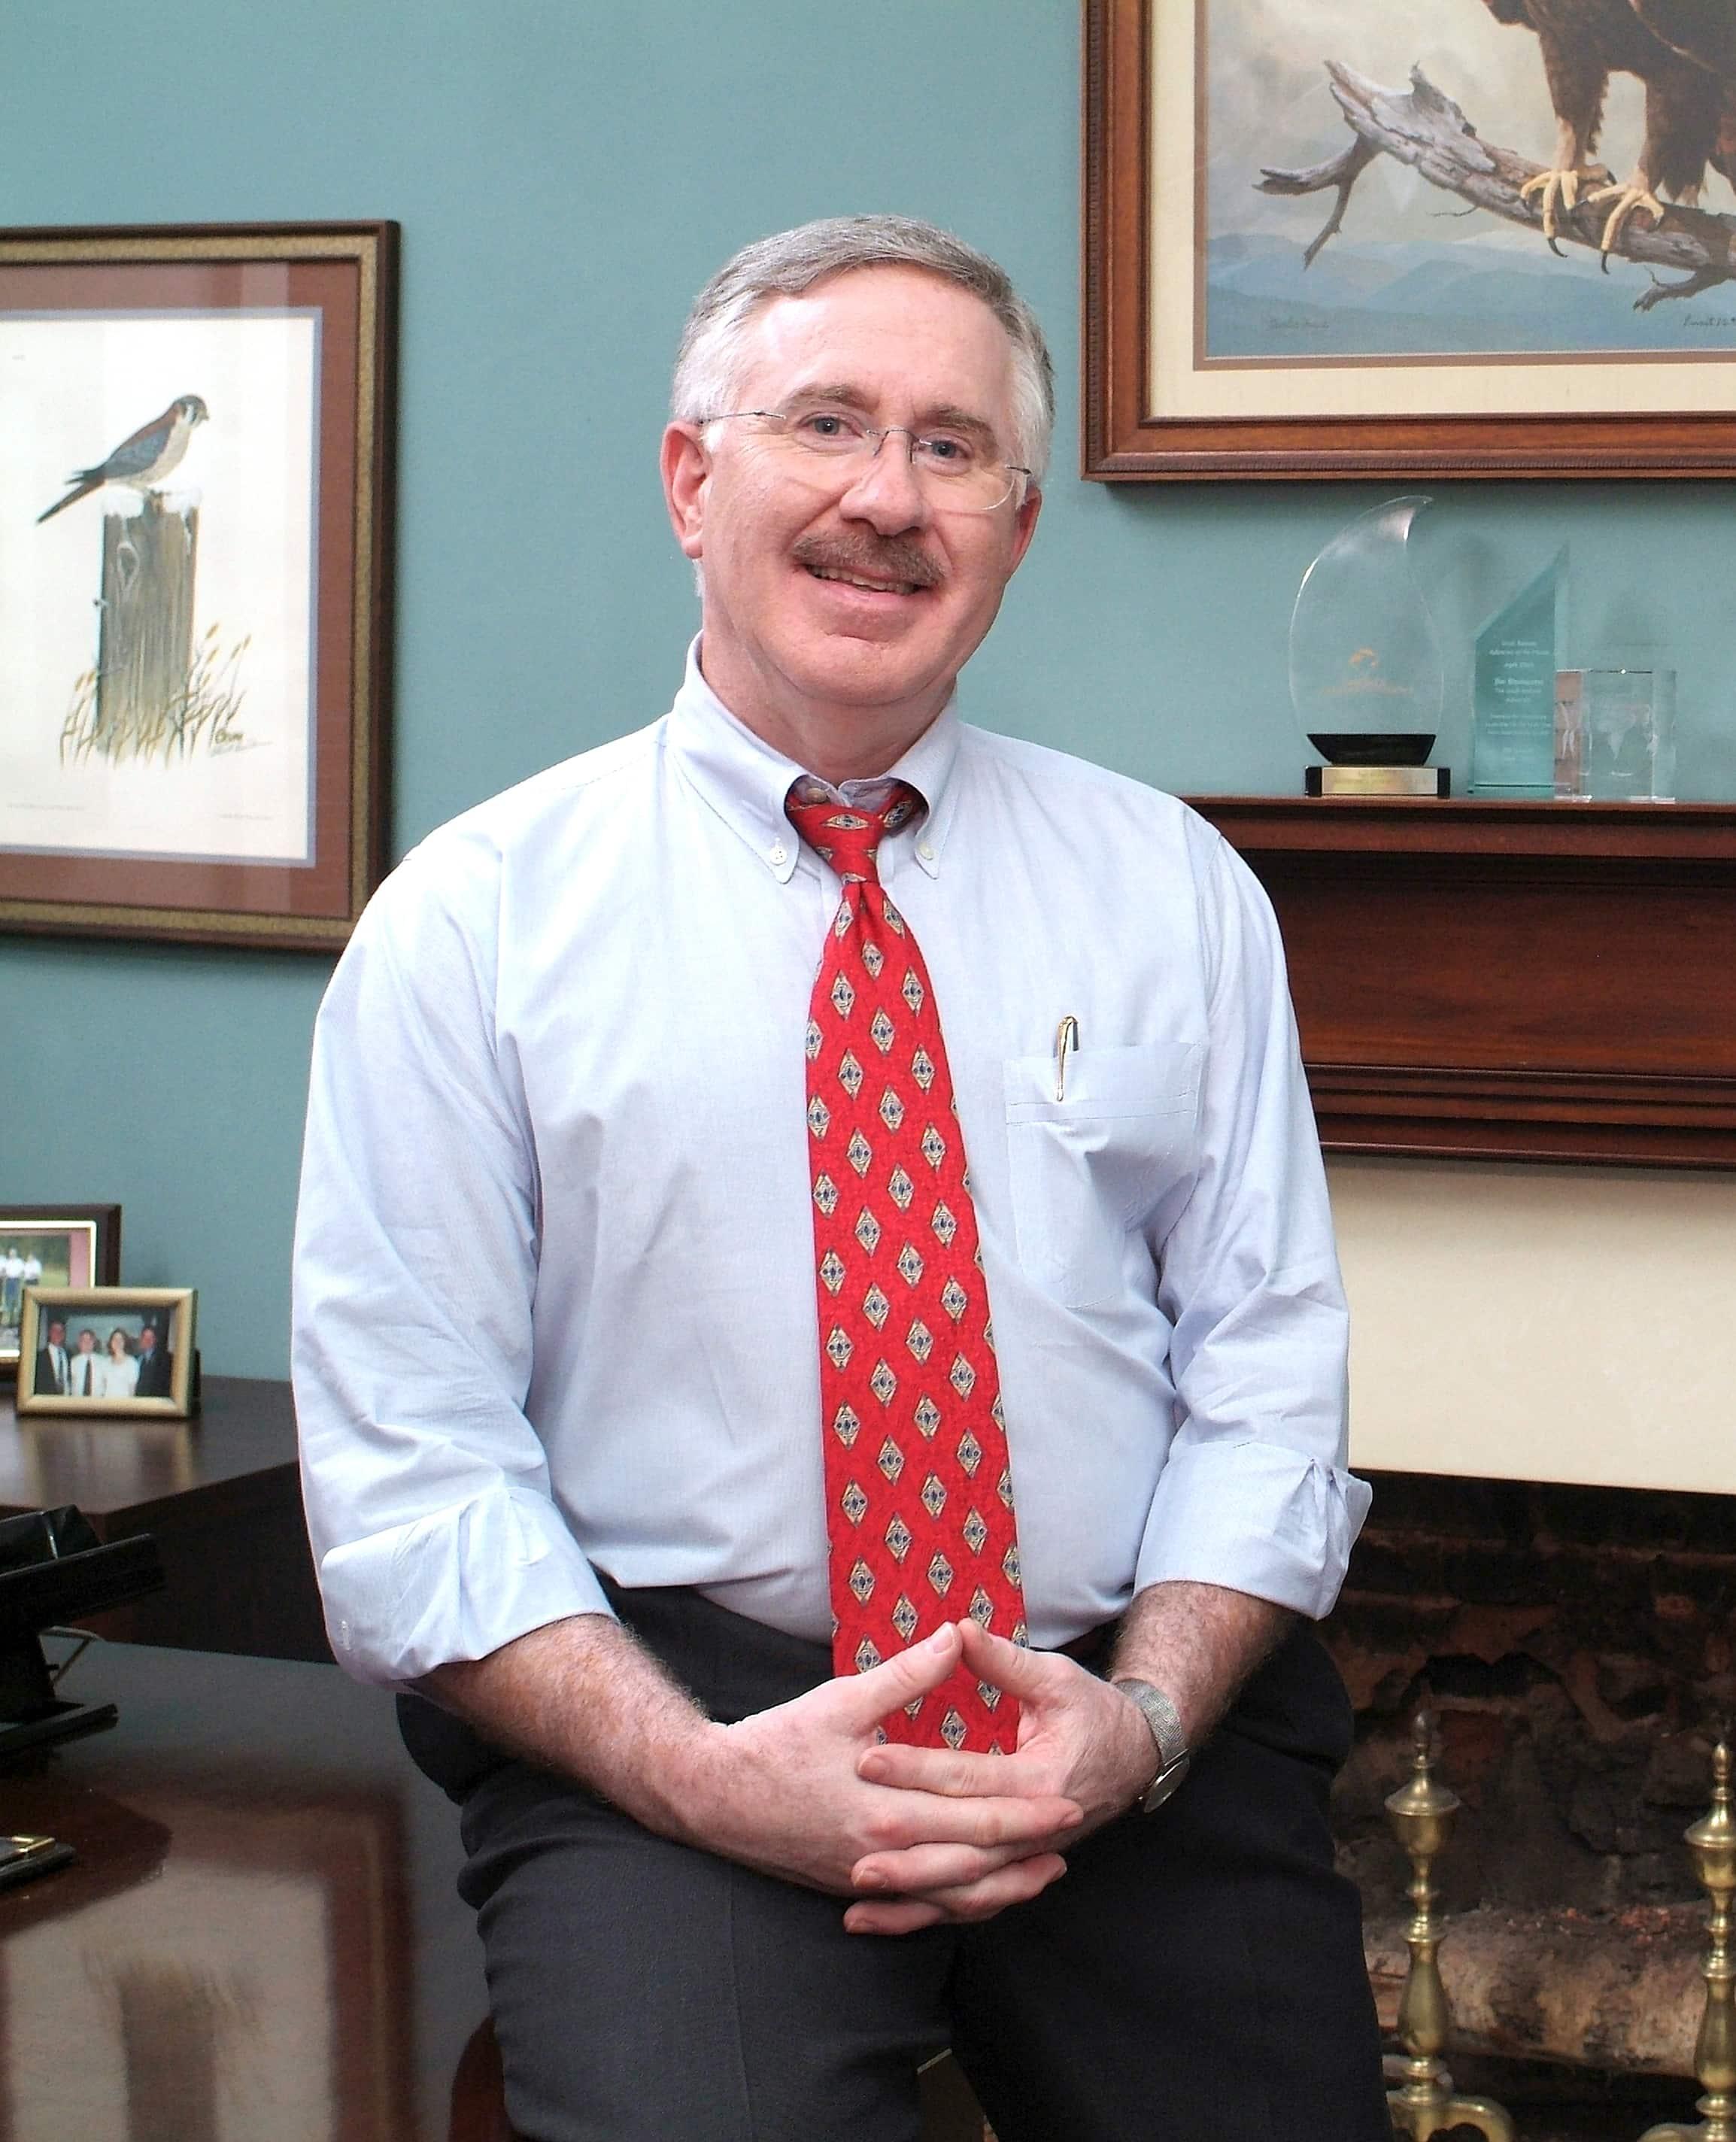 Featured on Friday: Jim Blasingame